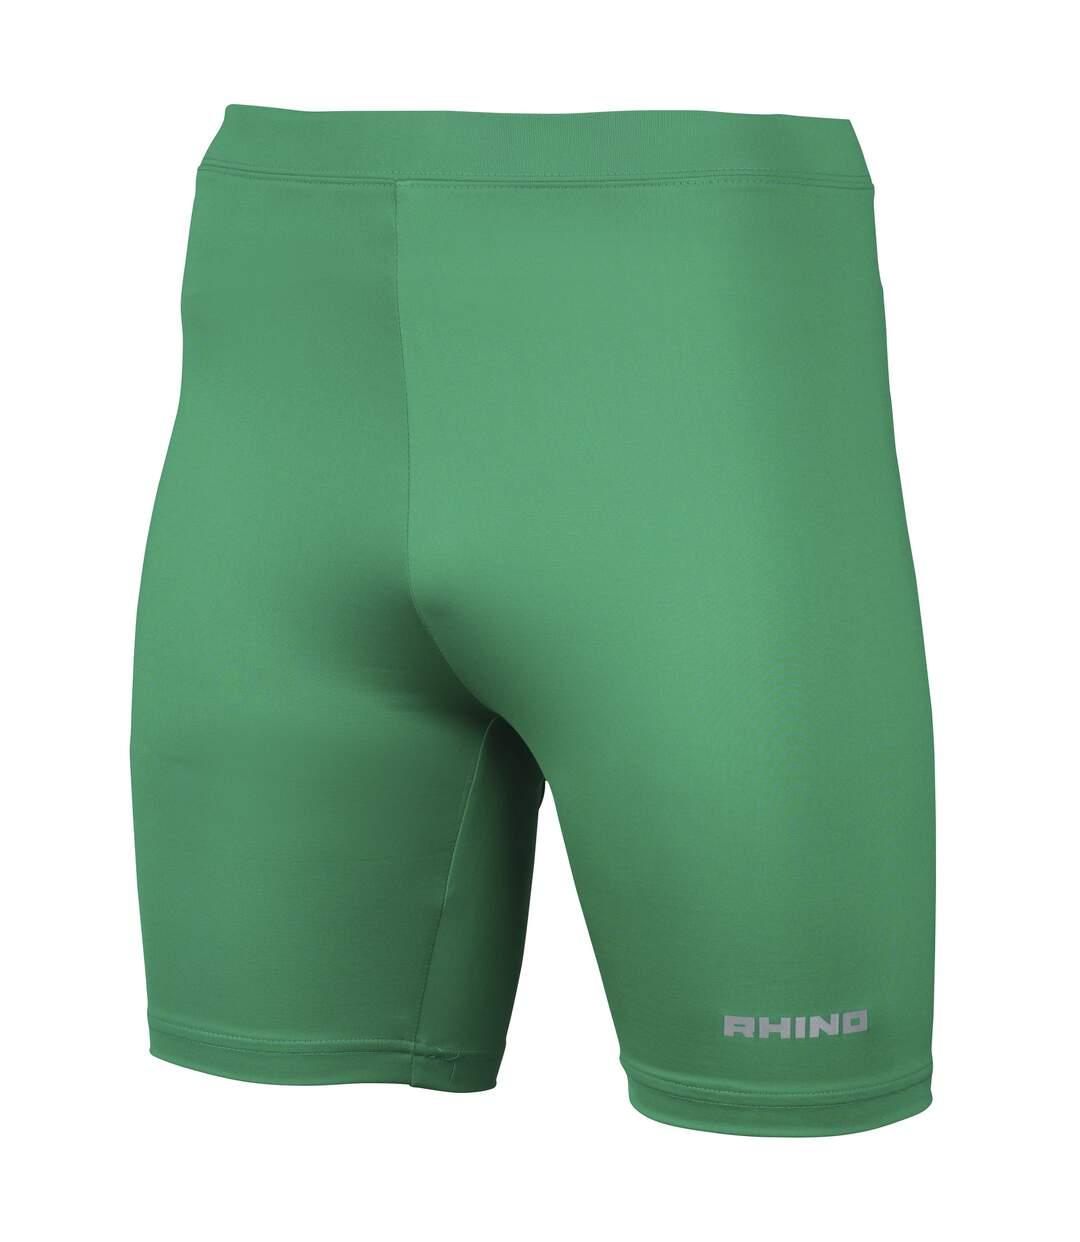 Rhino Mens Sports Base Layer Shorts (Green) - UTRW1278